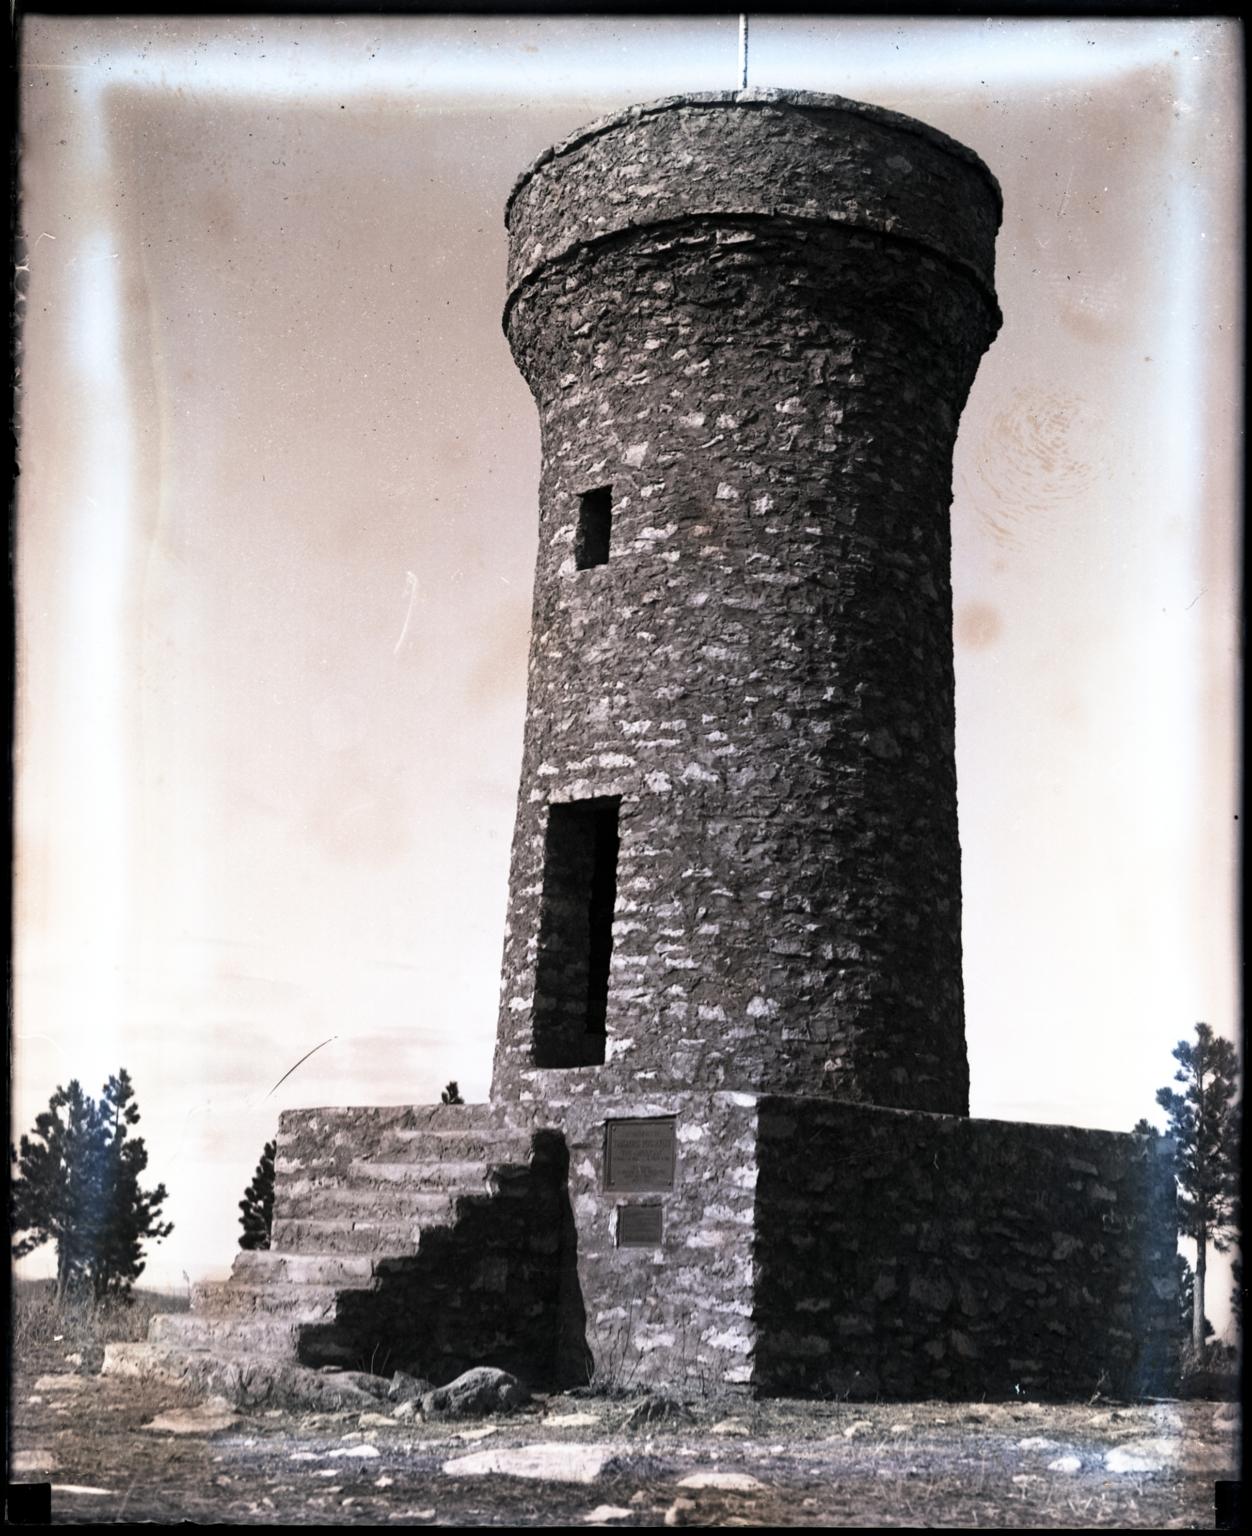 Friendship Tower Mount Roosevelt